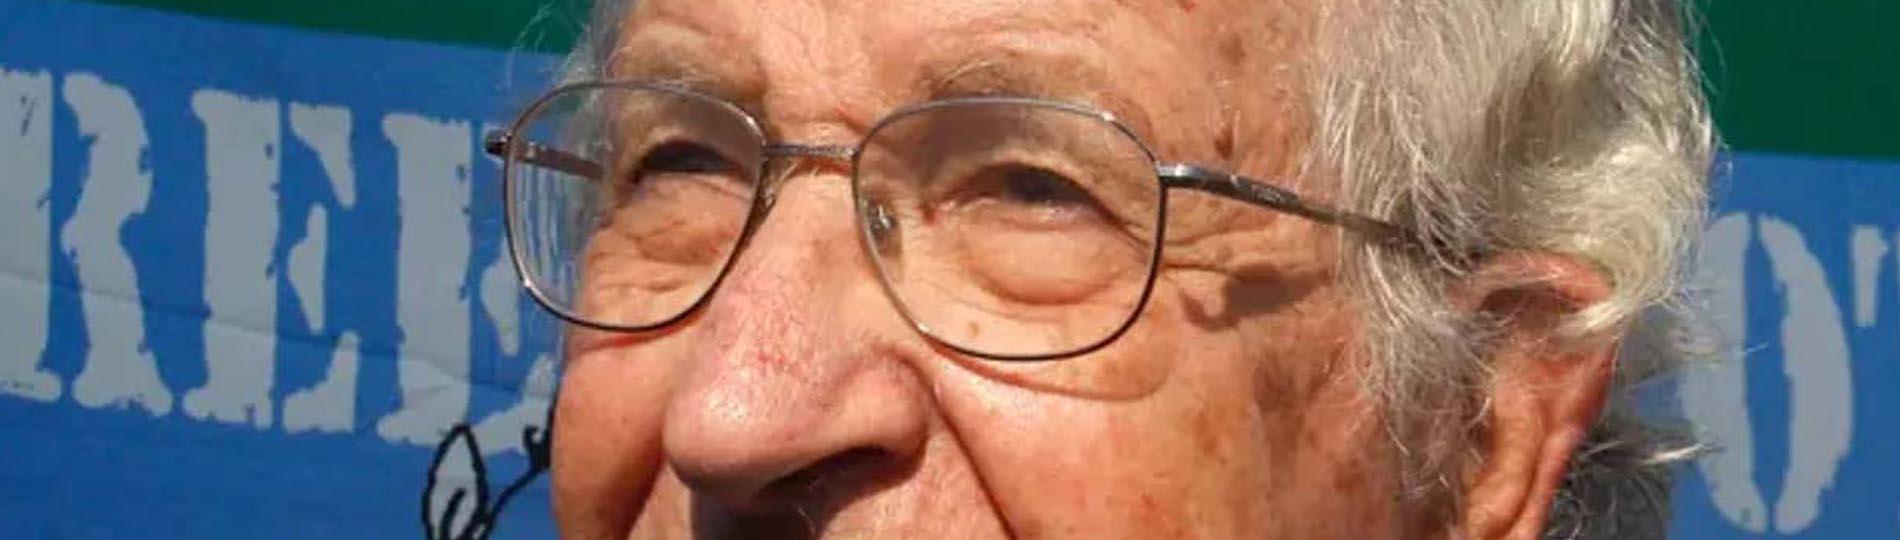 "Noam Chomsky: Social media is ""undermining democracy"""